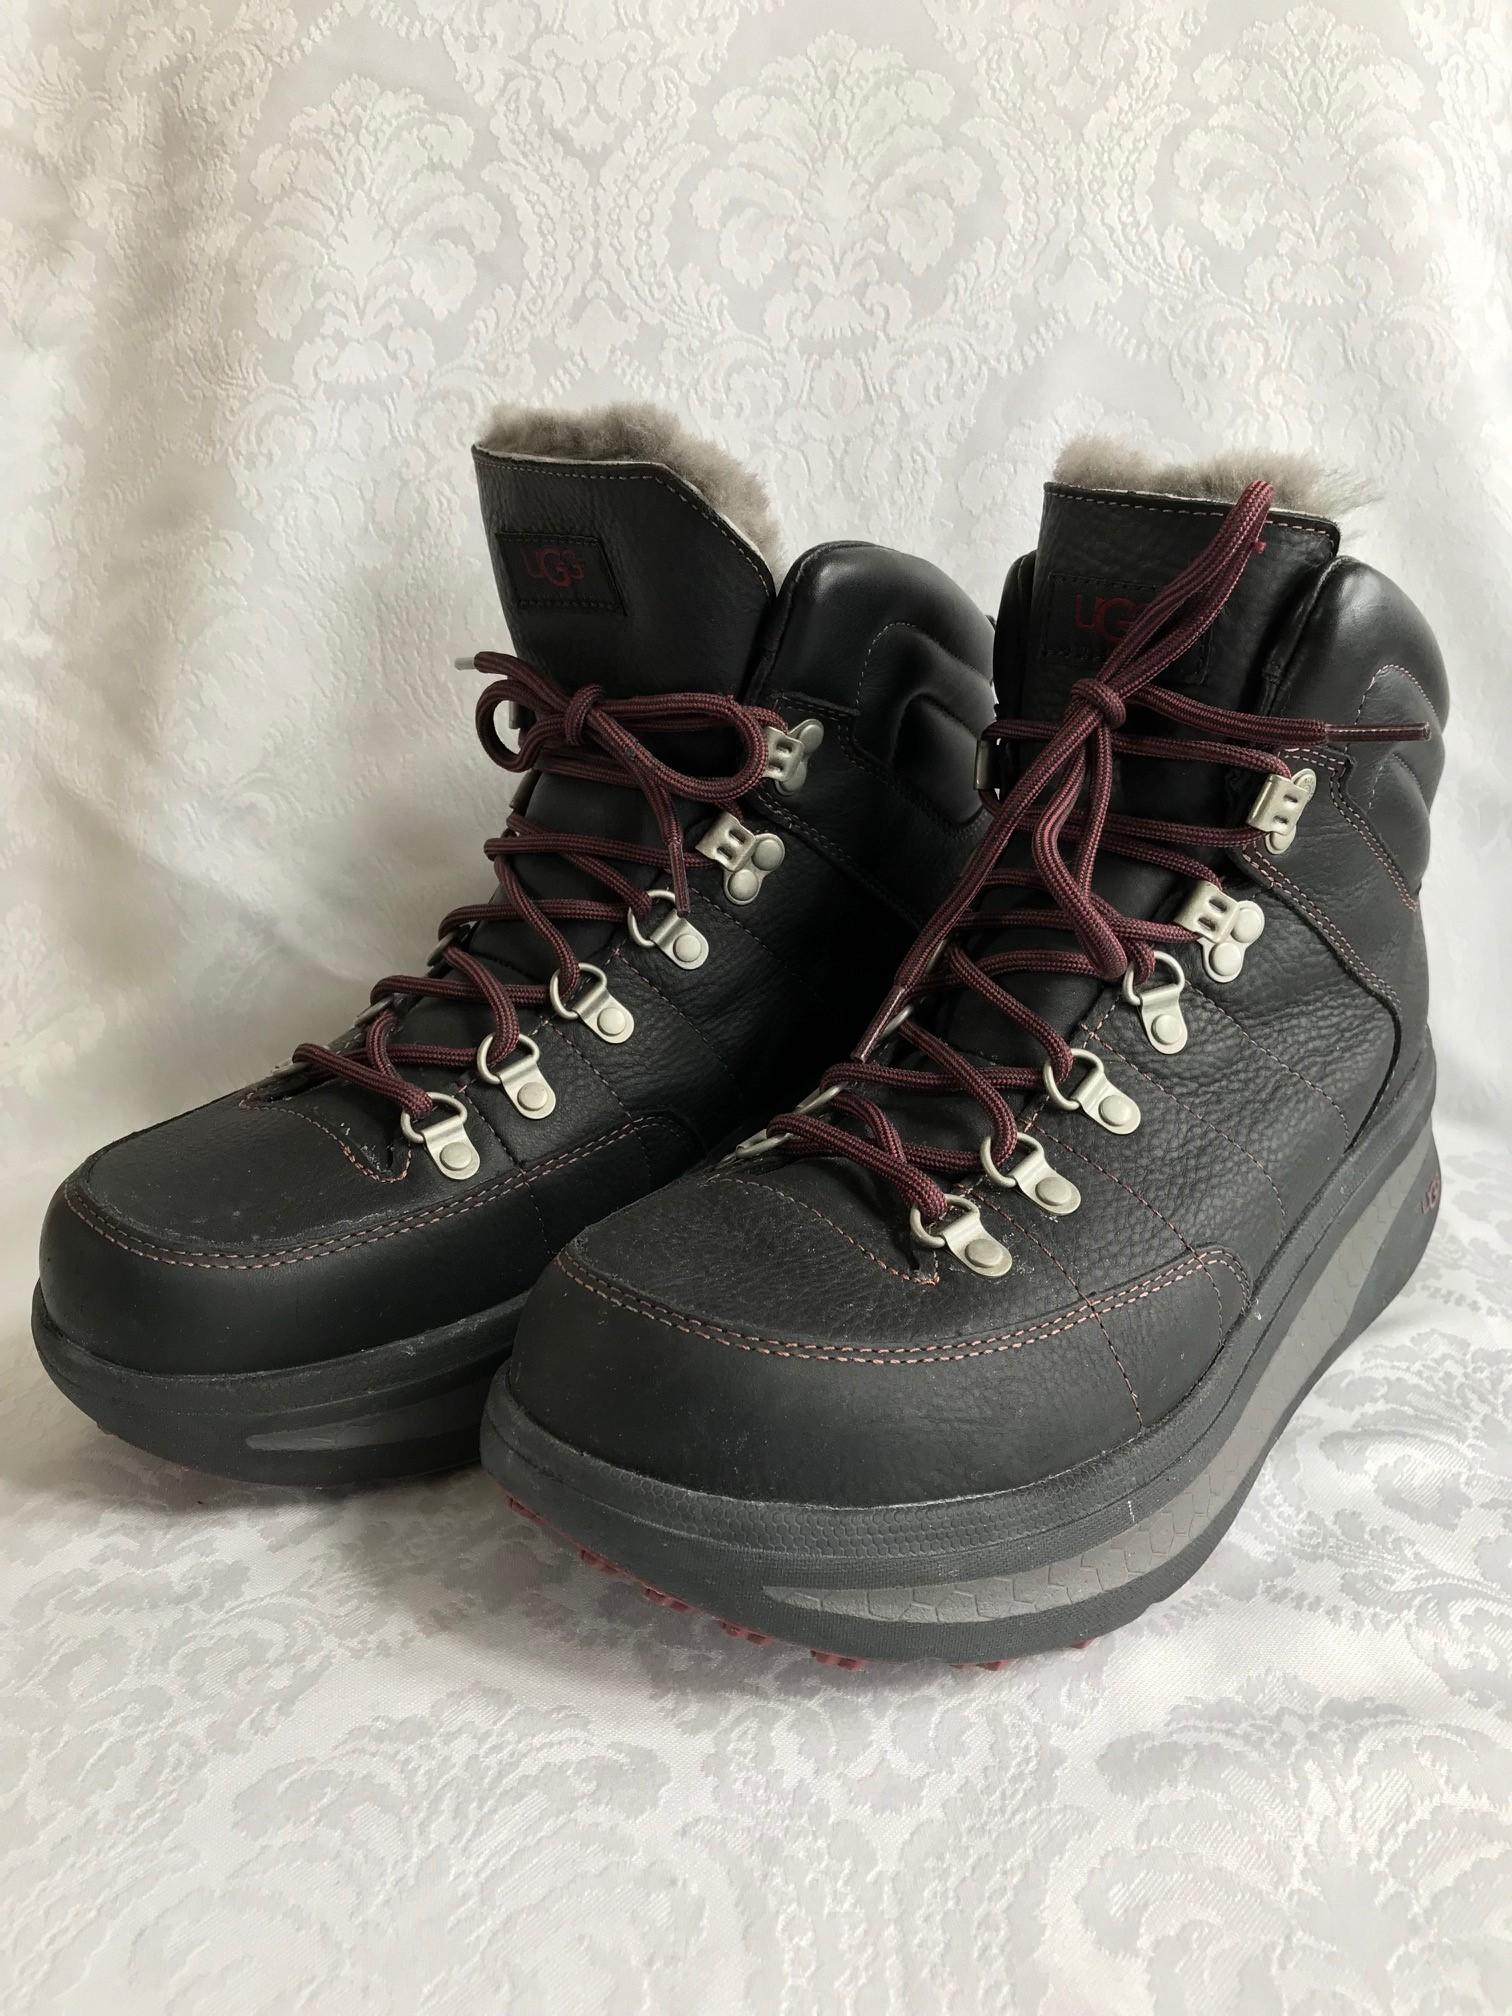 Ugg-Mens-Rain-Snow-Boot-WATERPROOF-w-Thinsulate-Shoes-US-11-Gray-Sheepskin-Exc